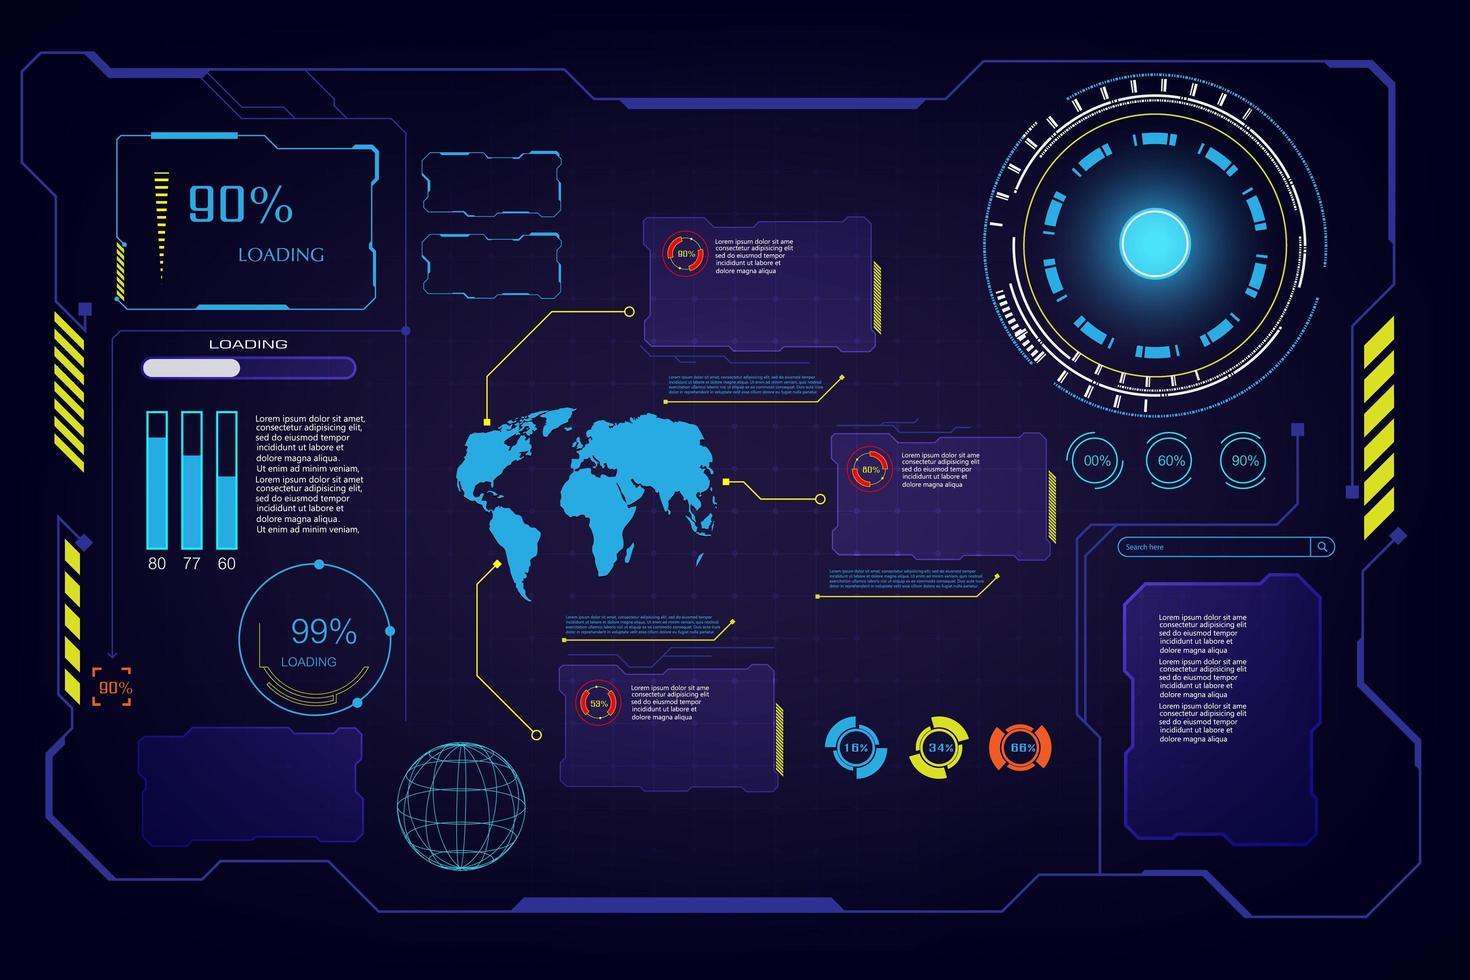 futuristische gui interface-element ingesteld vector